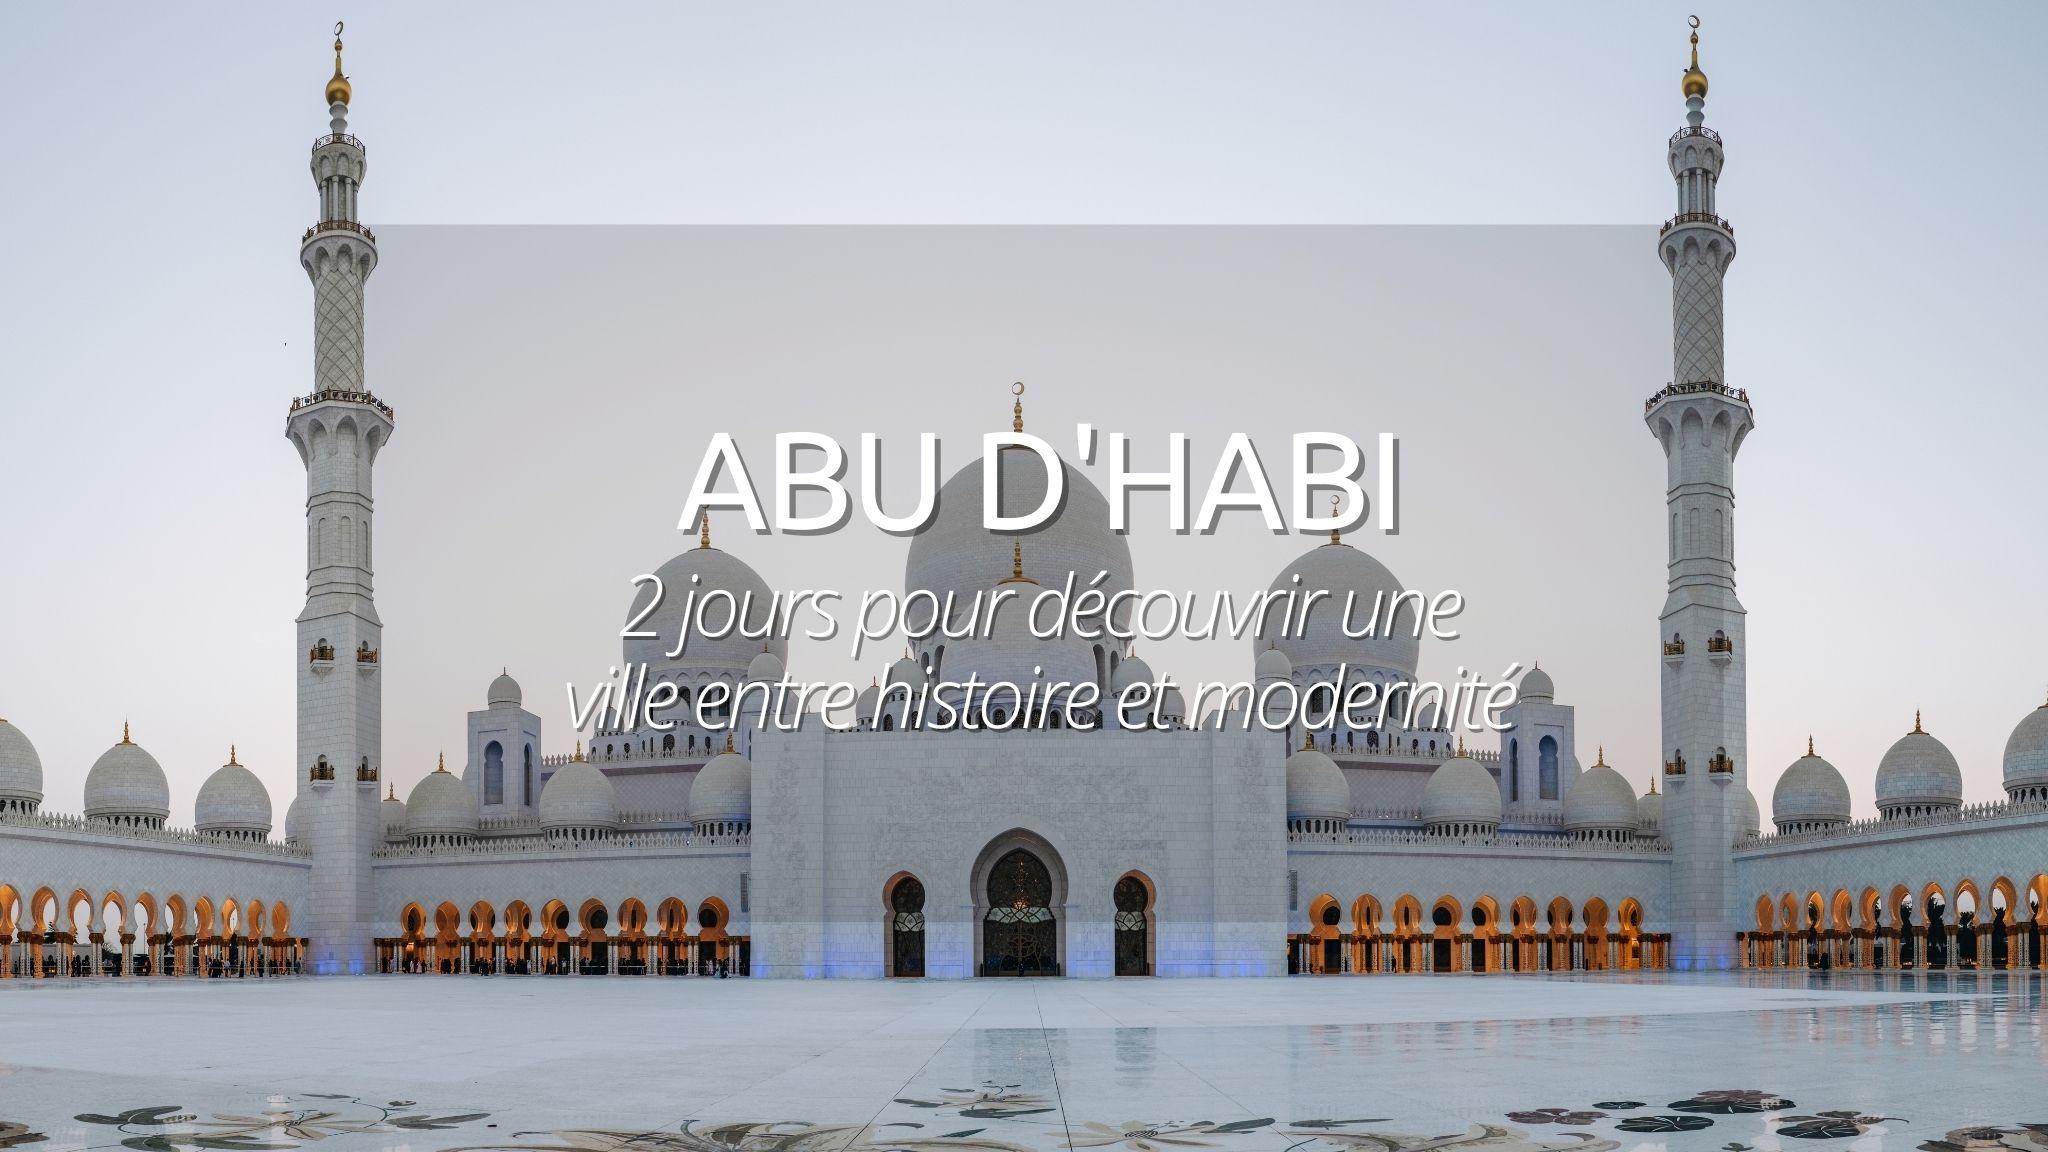 Abu Dhabi : 2 jours 2 merveilles